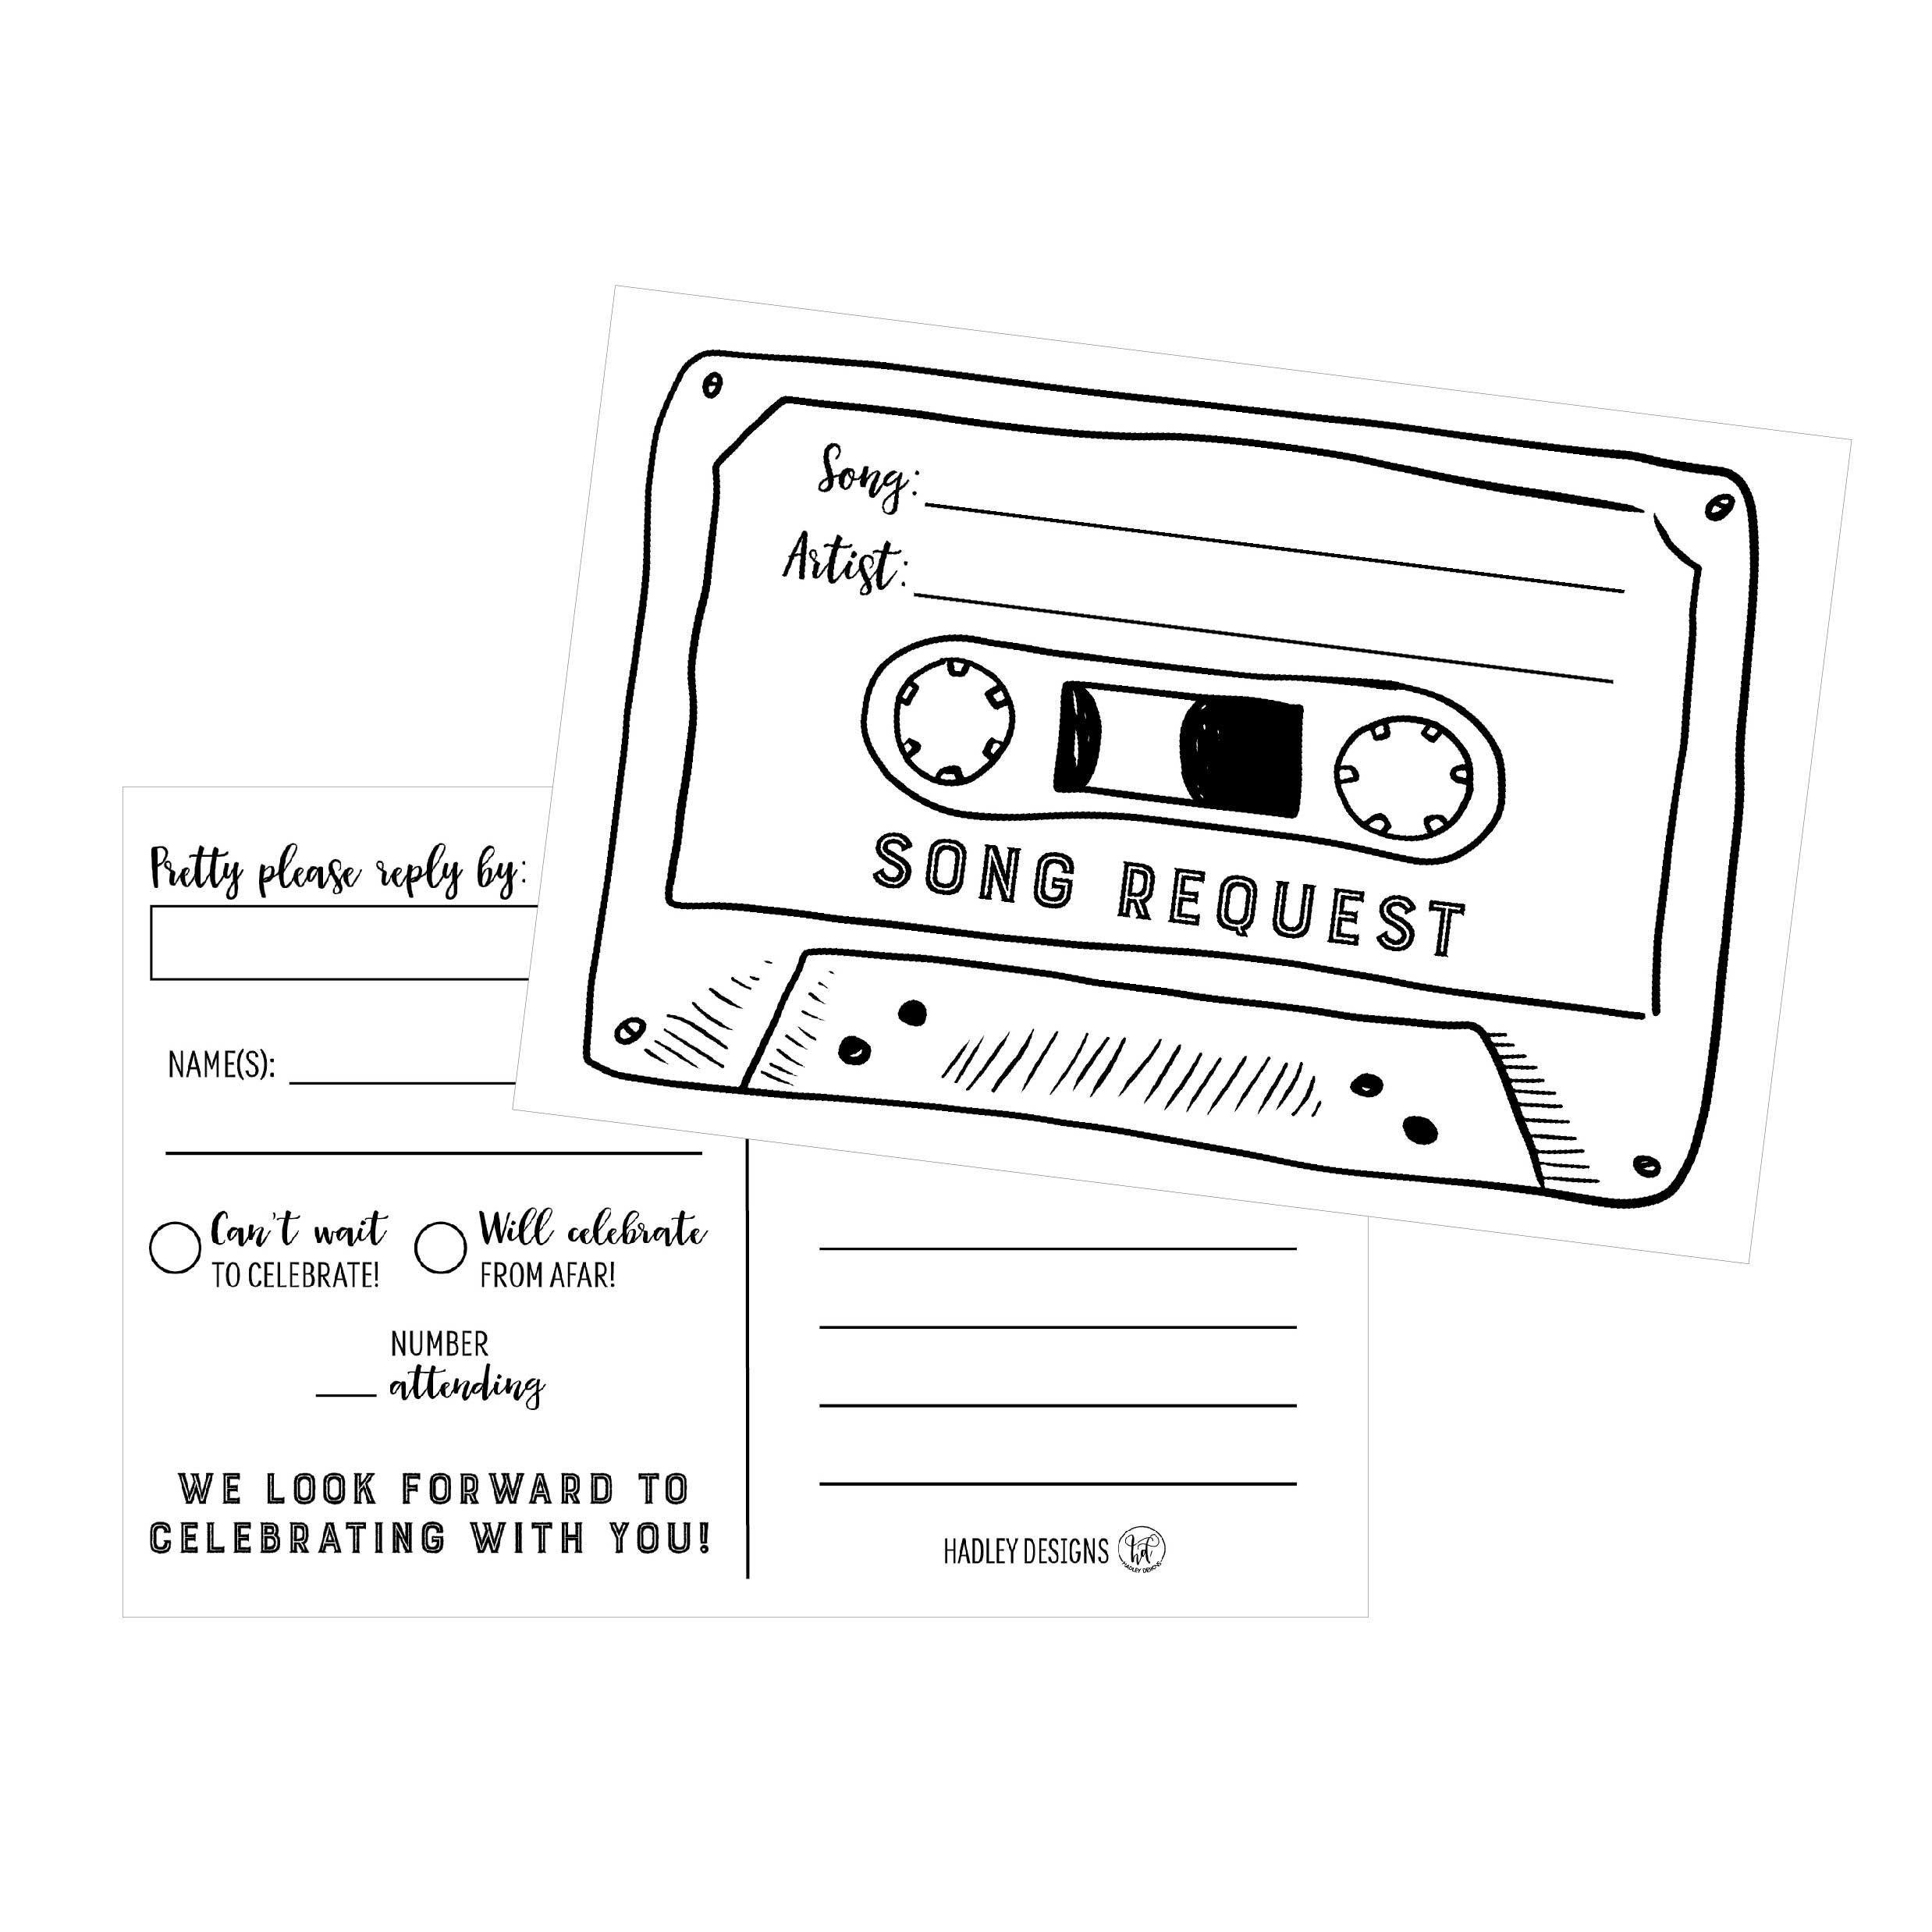 50 Song Request Cassette Tape Generic Rsvp Cards Rsvp Postcards No Envelopes Needed Respons Evening Wedding Invitations Song Request Wedding Invitations Rsvp